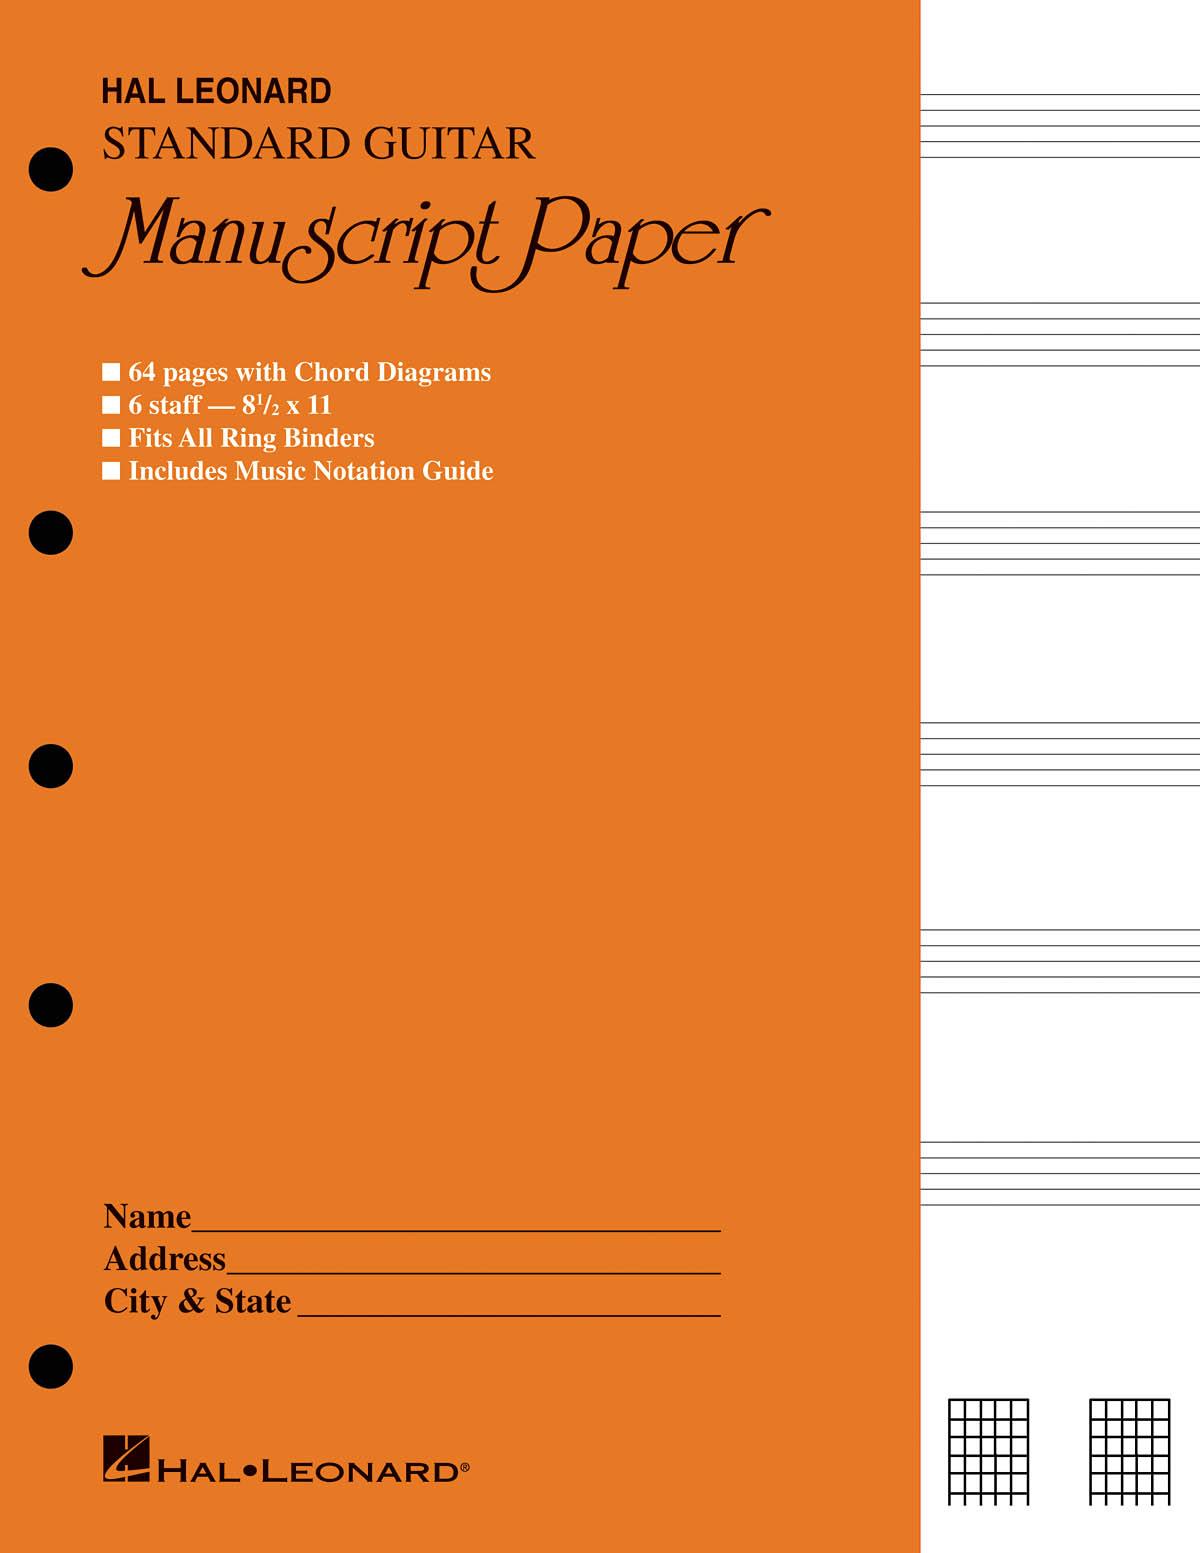 Guitar Manuscript Paper - Standard (Gold Cover): Manuscript Paper: Manuscript